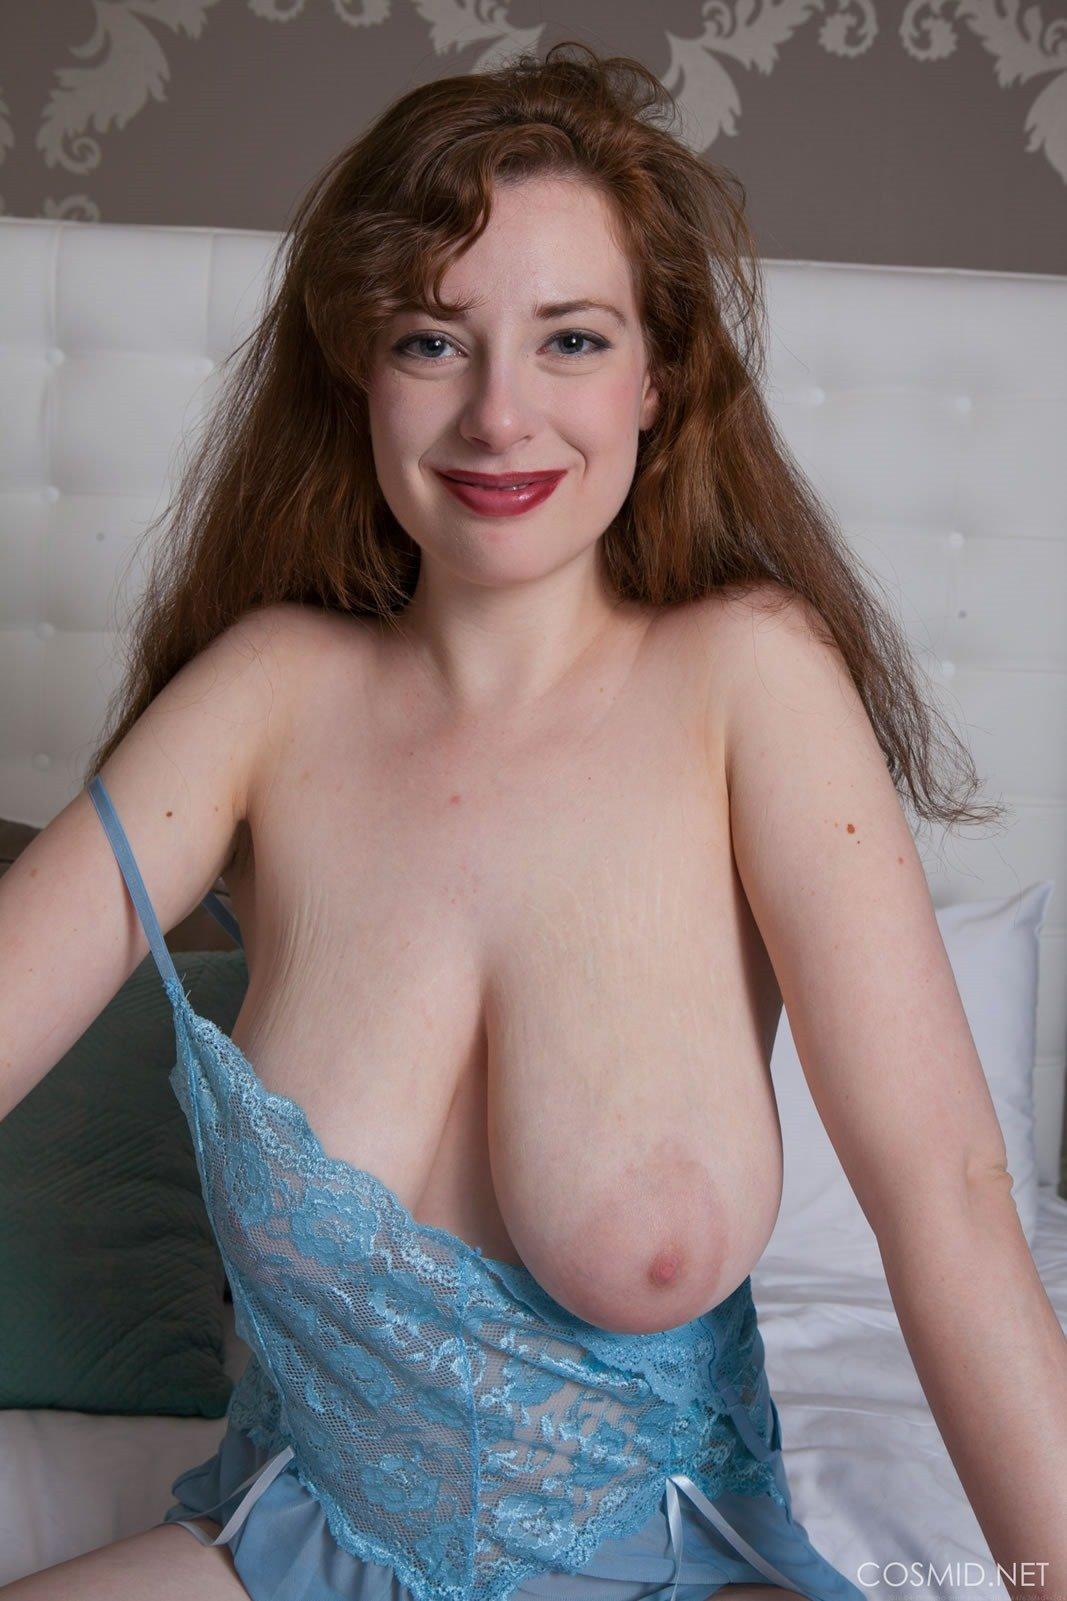 gujarati girl stripped naked